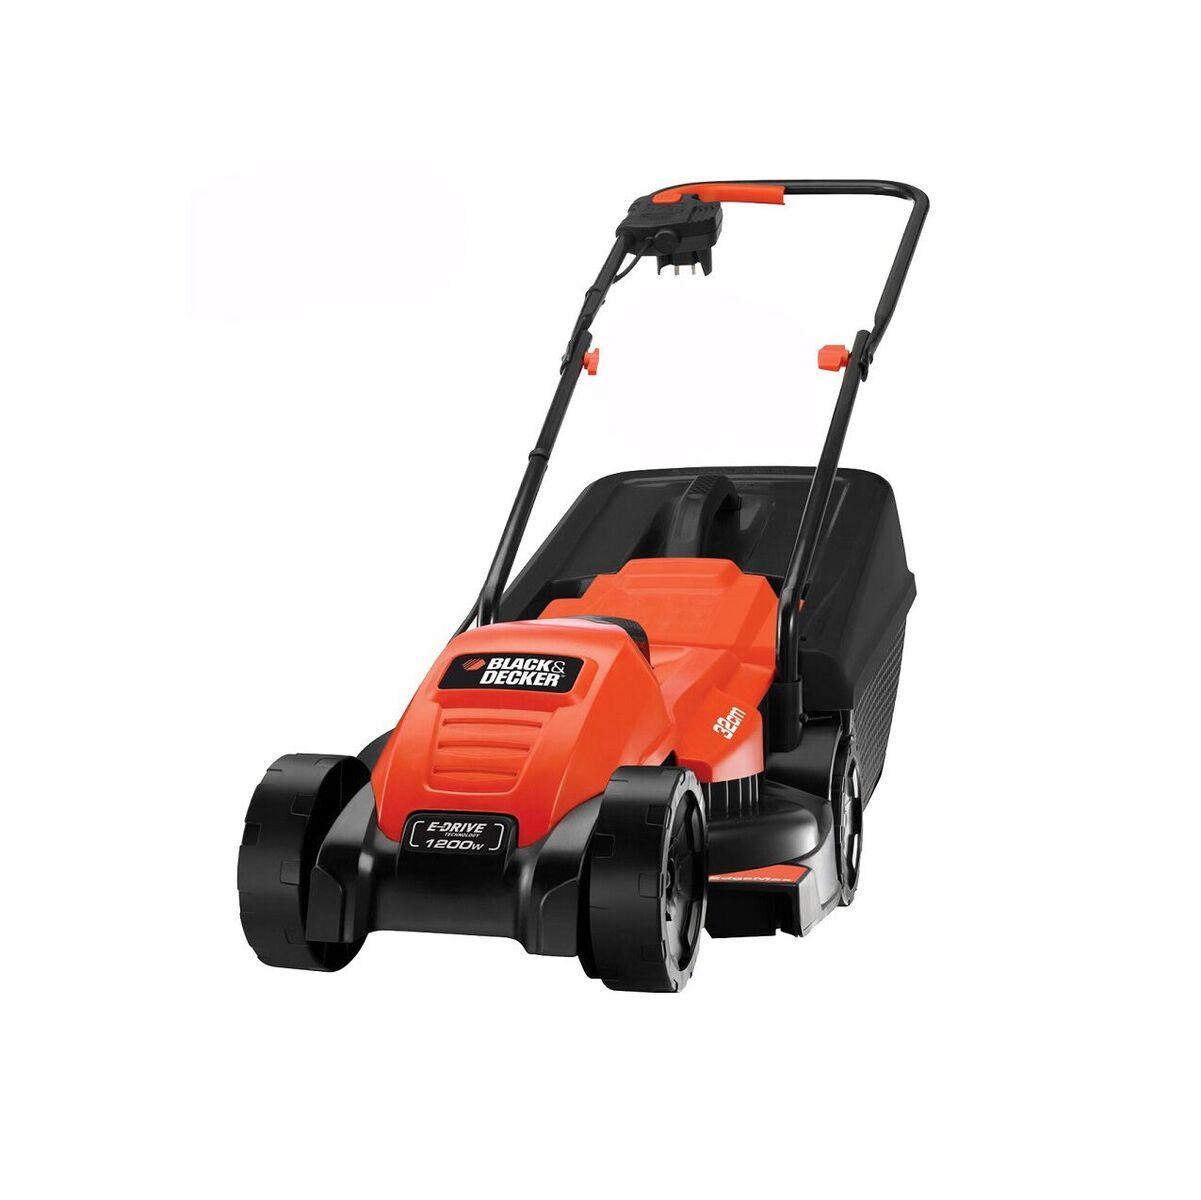 EMAX32-B1 Black+Decker  - Máy cắt cỏ